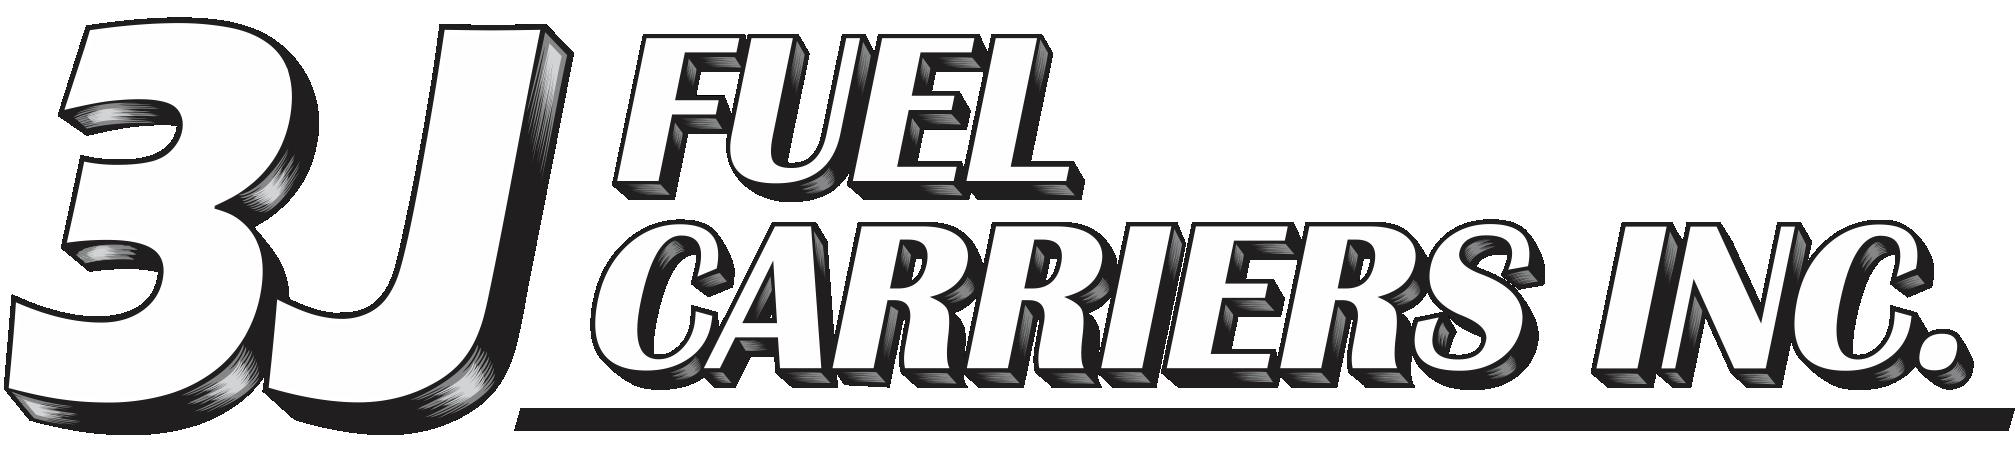 3J Fuel Carriers Inc.